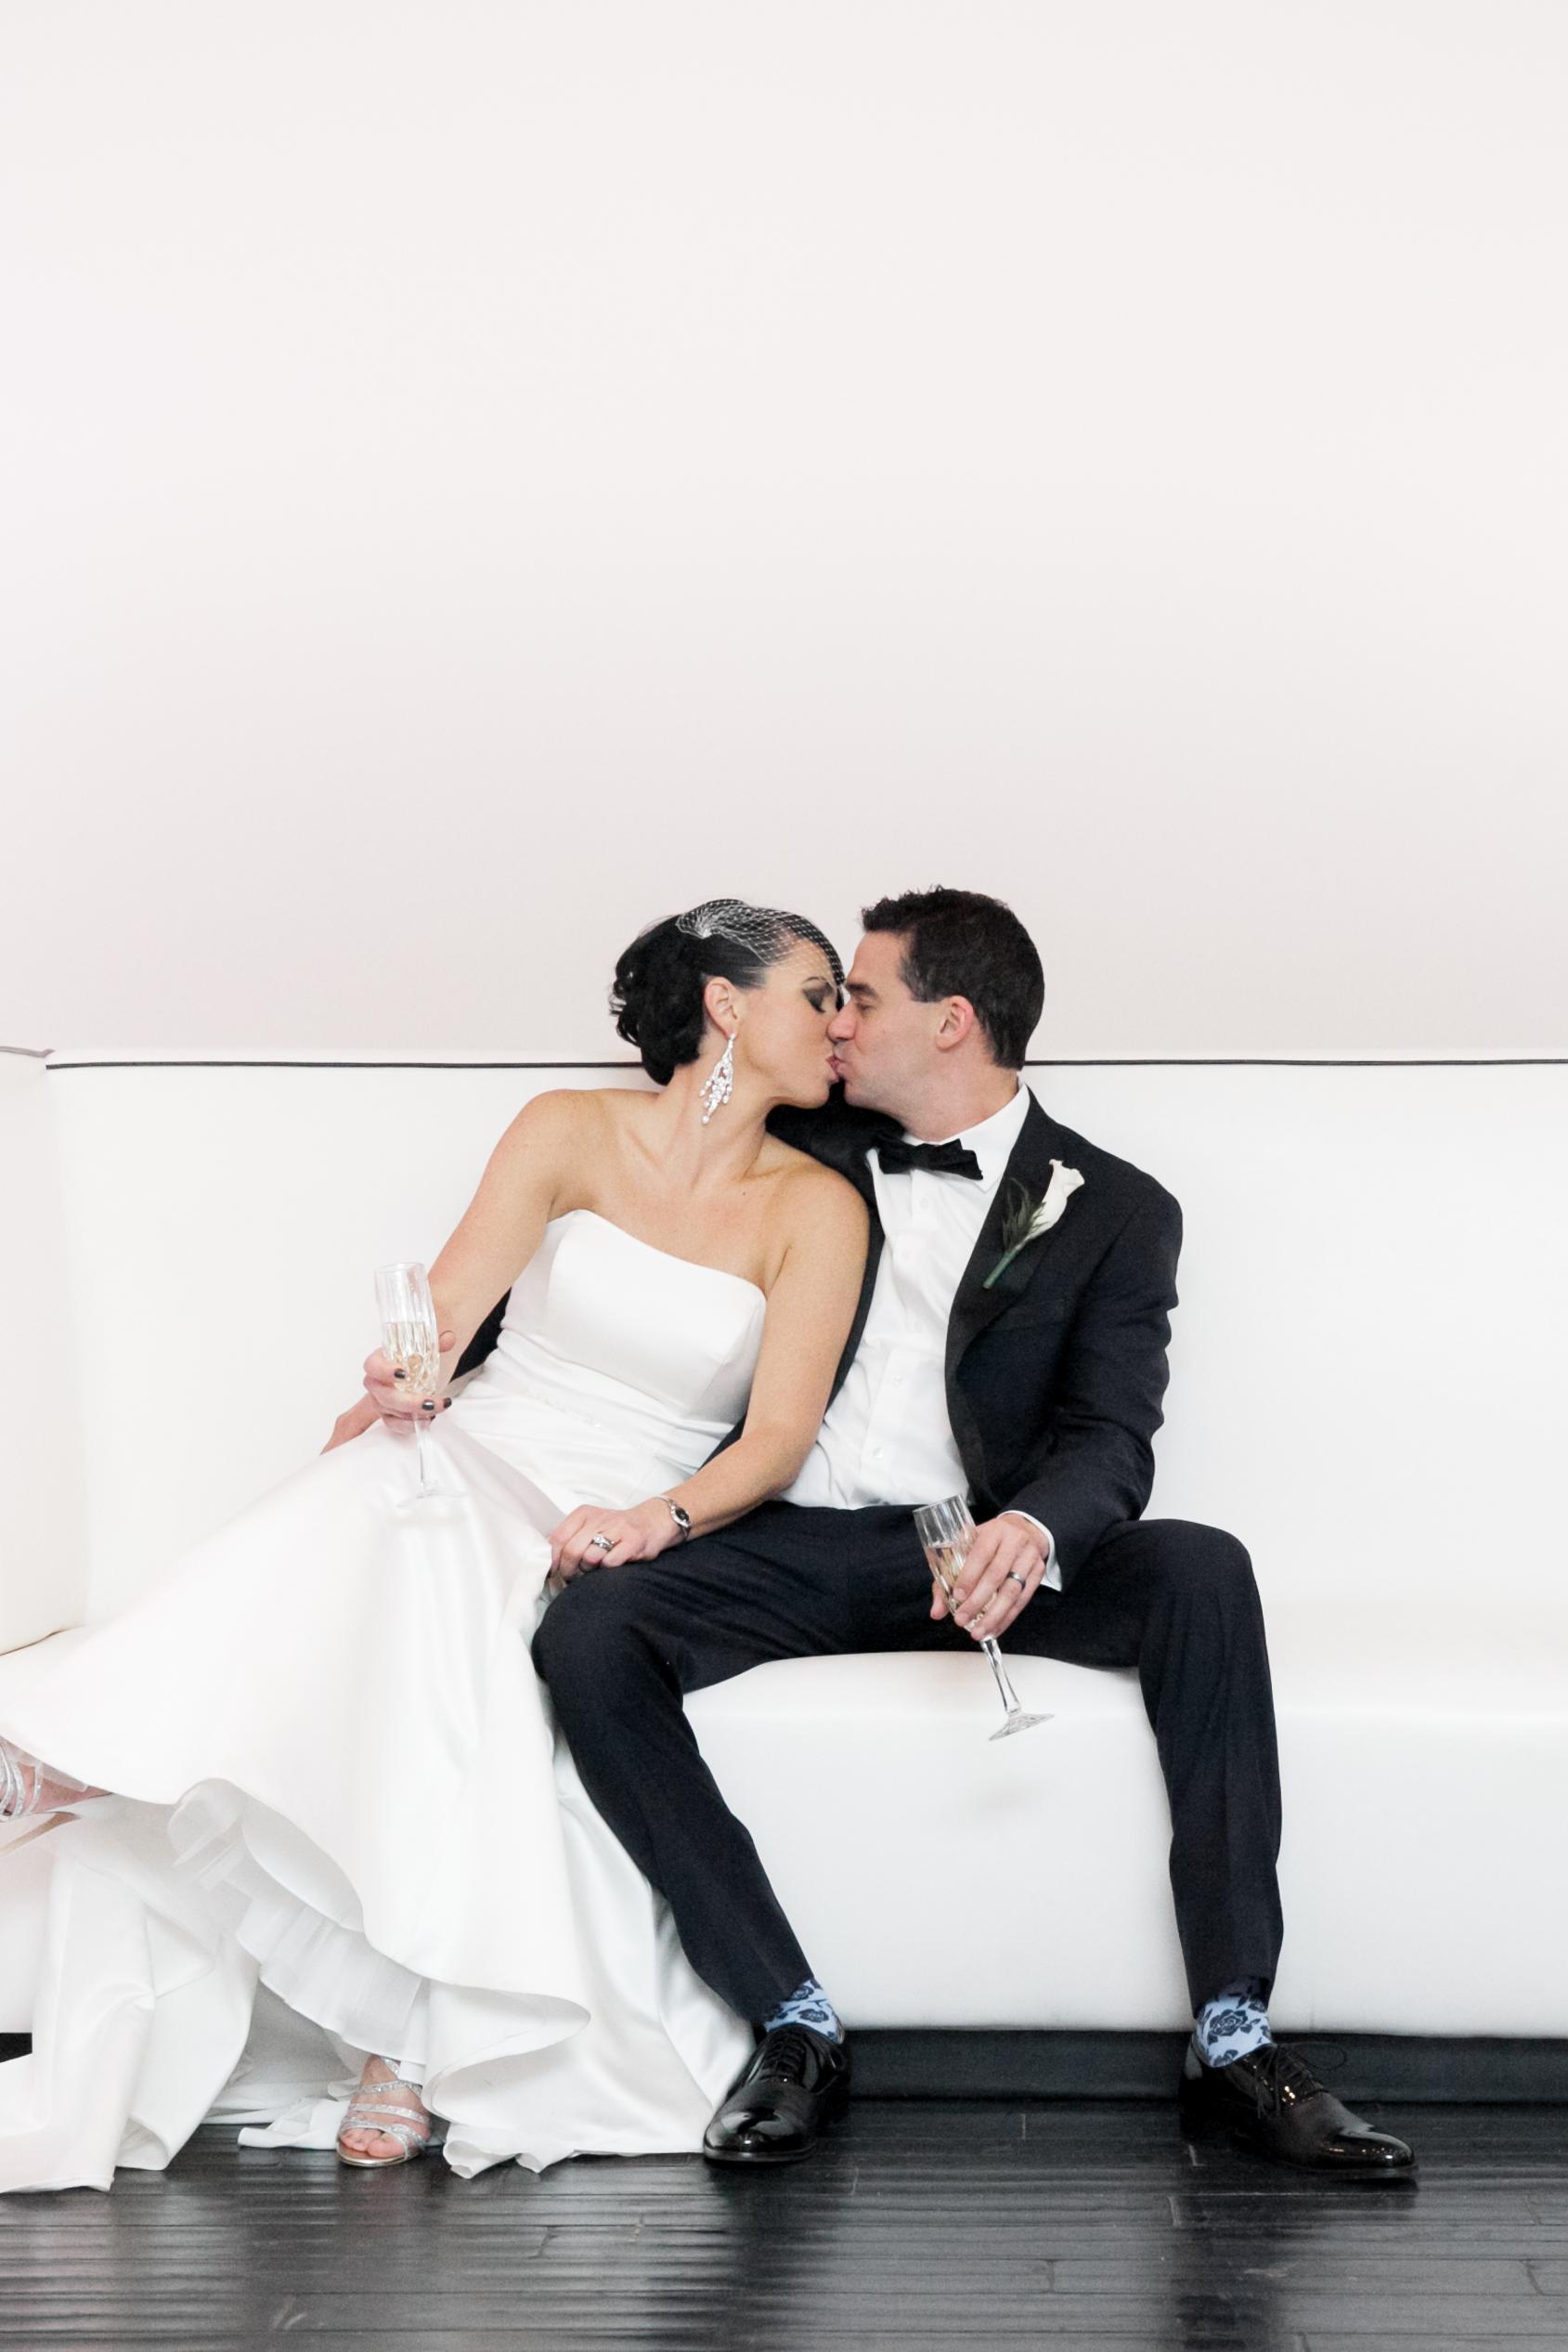 LisaDiederichPhotography_weddingtestimonials-1.jpg